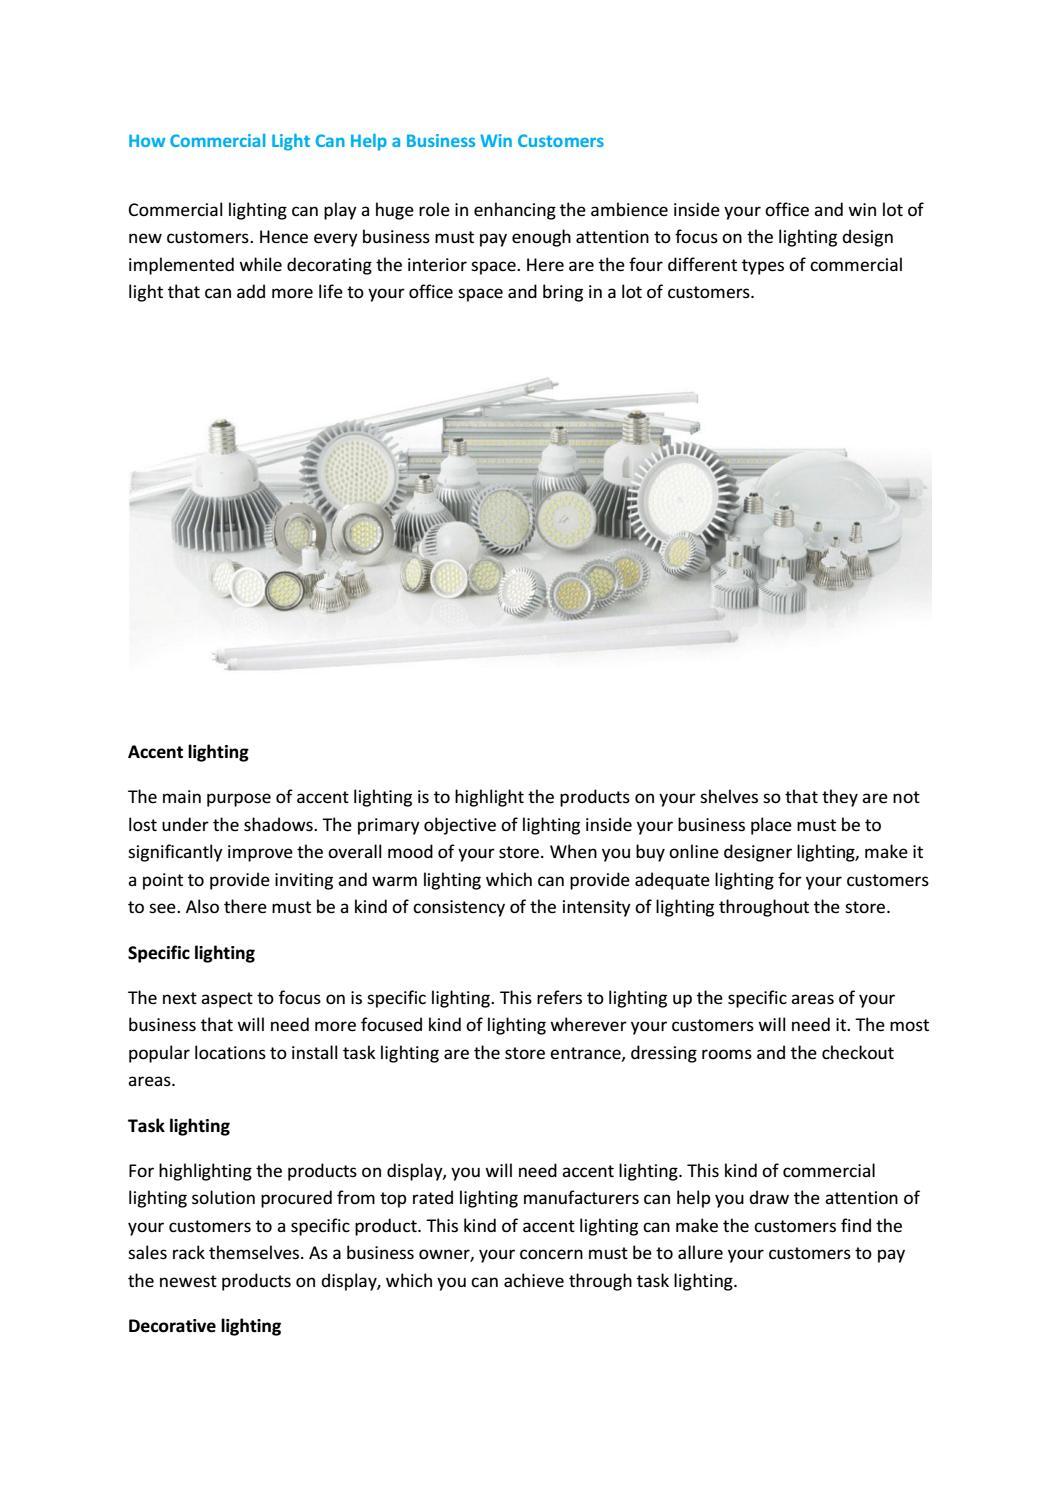 Online Designer Lighting In